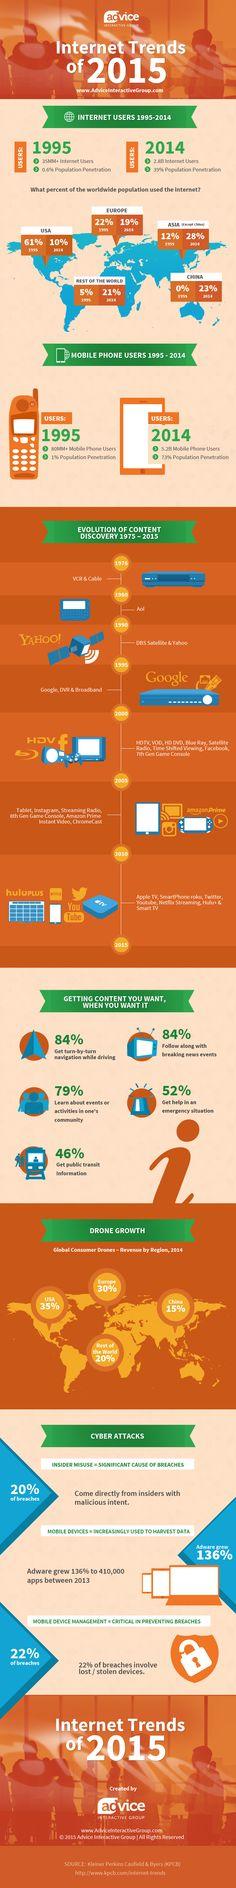 Internet Trends of 2015 #infographic #Marketing #Internet #DigitalMarketing